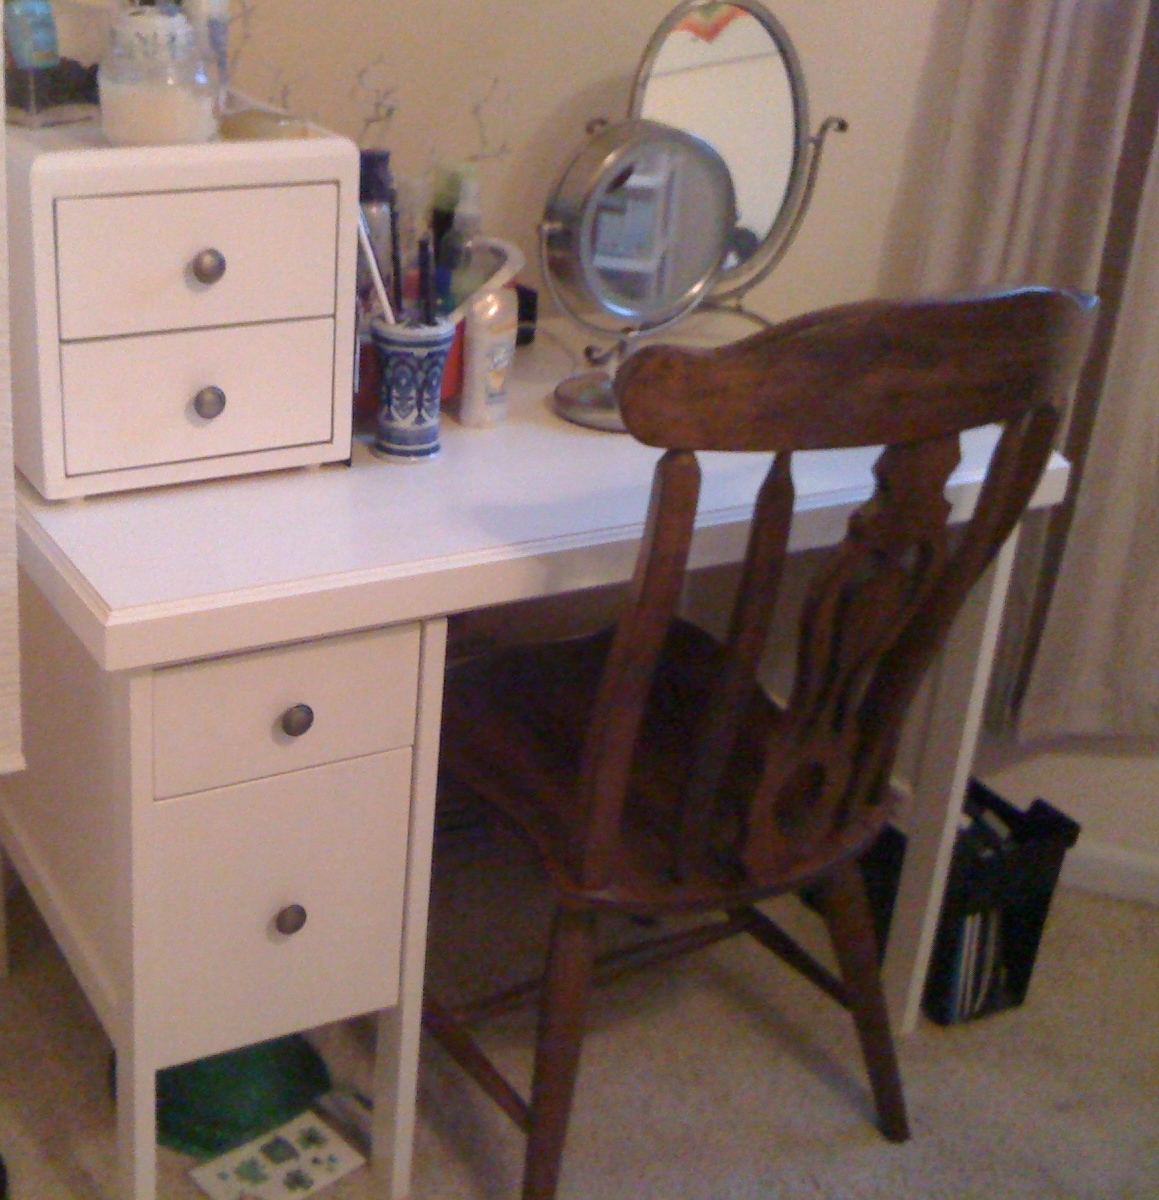 Student Desk/Vanity